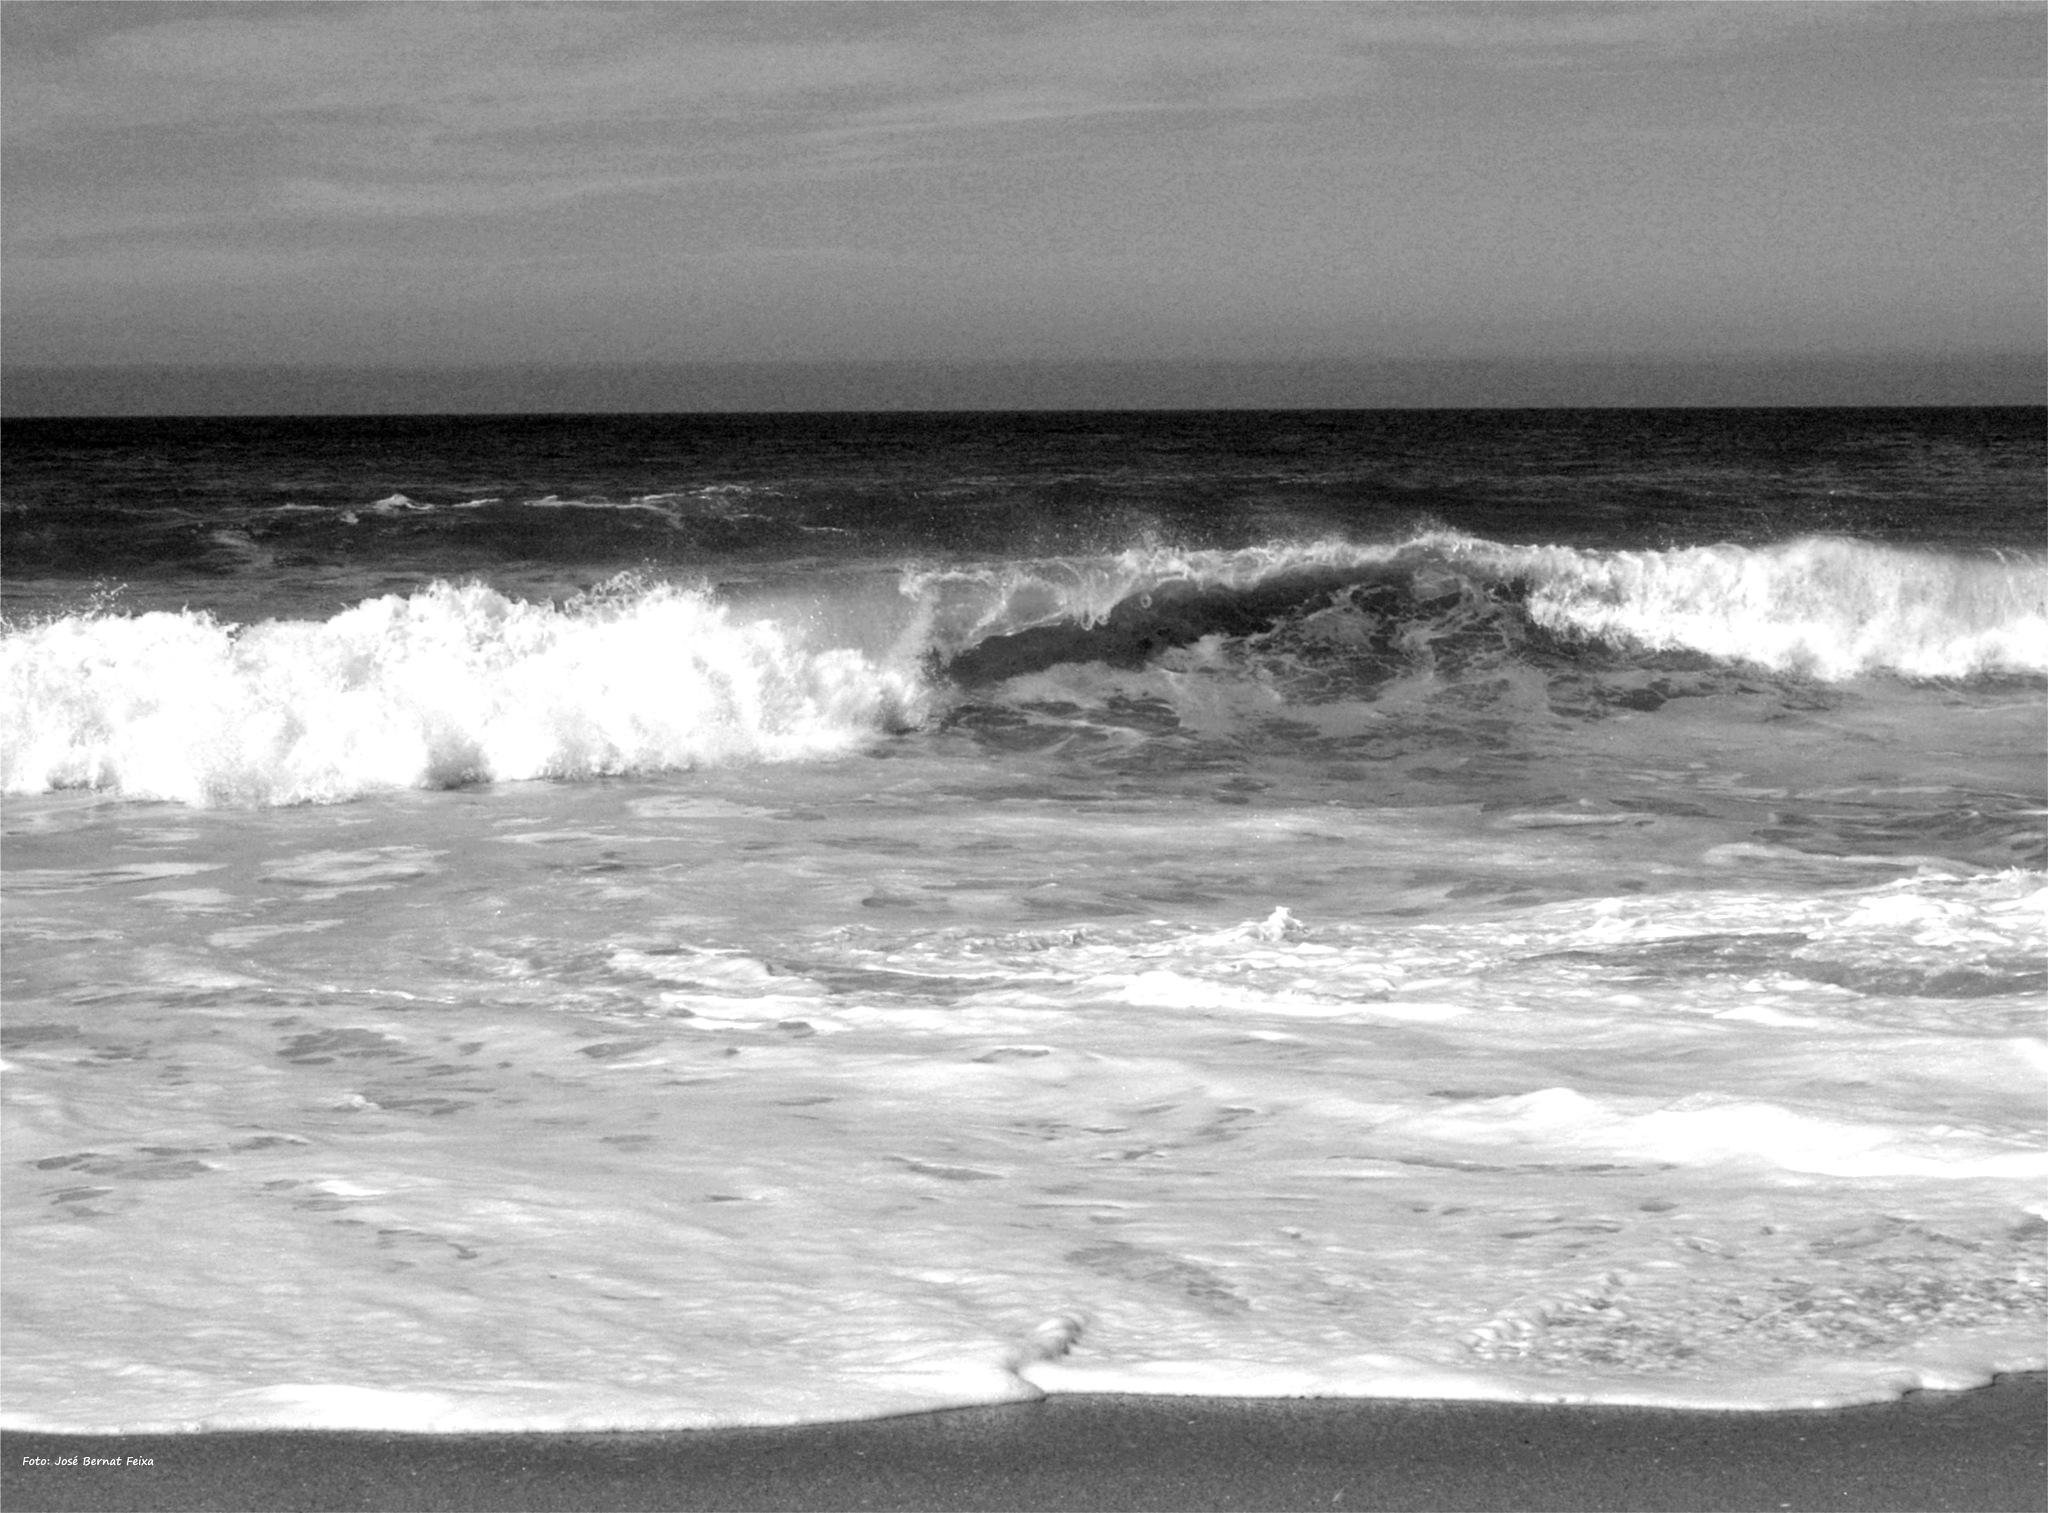 OLAS ; BRANDING ; WAVES by José Bernat Feixa